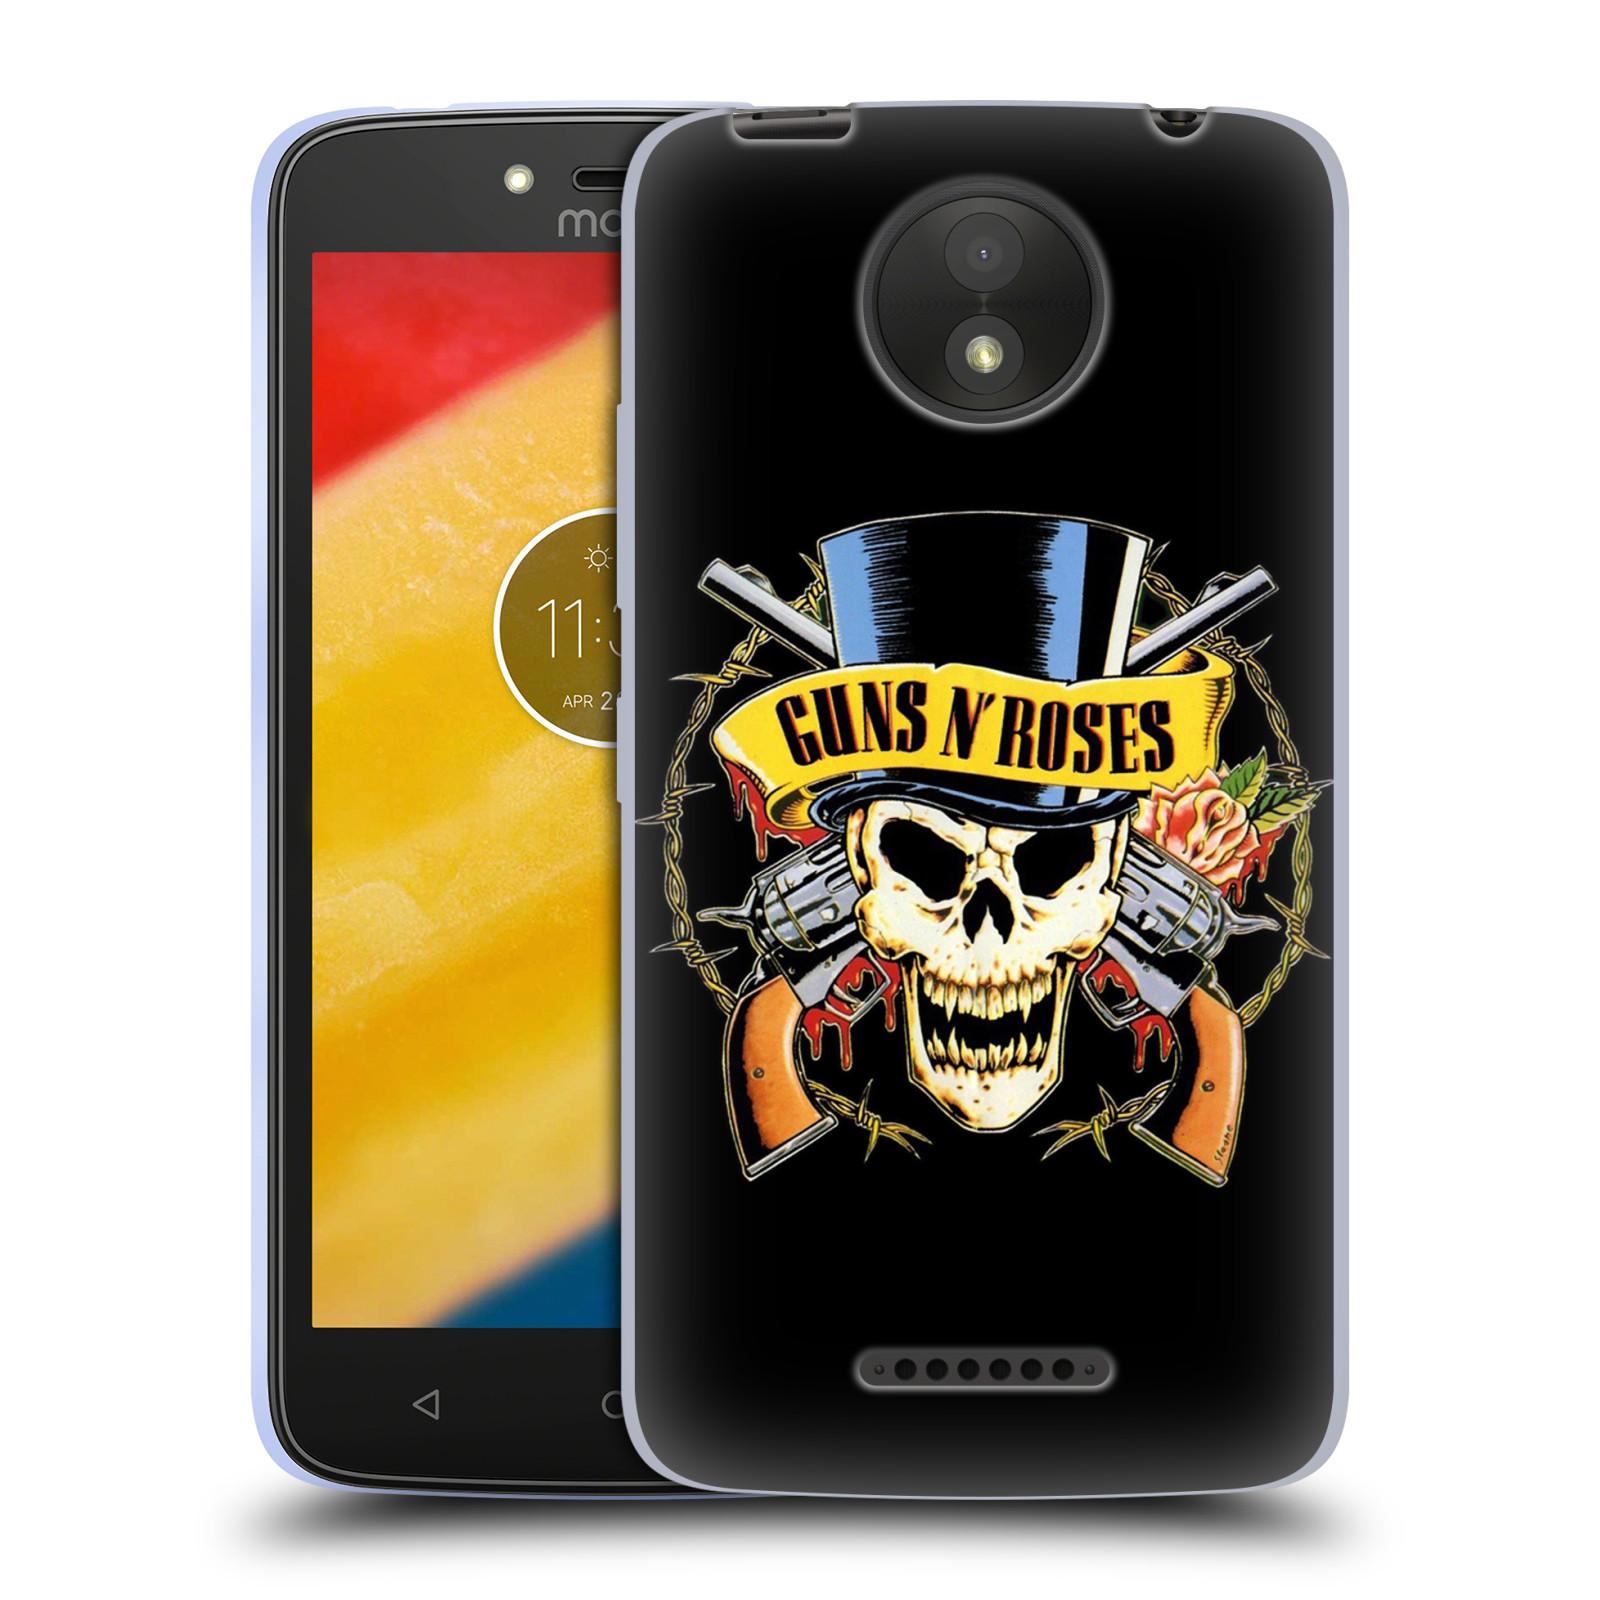 Silikonové pouzdro na mobil Lenovo Moto C Plus - Head Case - Guns N' Roses - Lebka